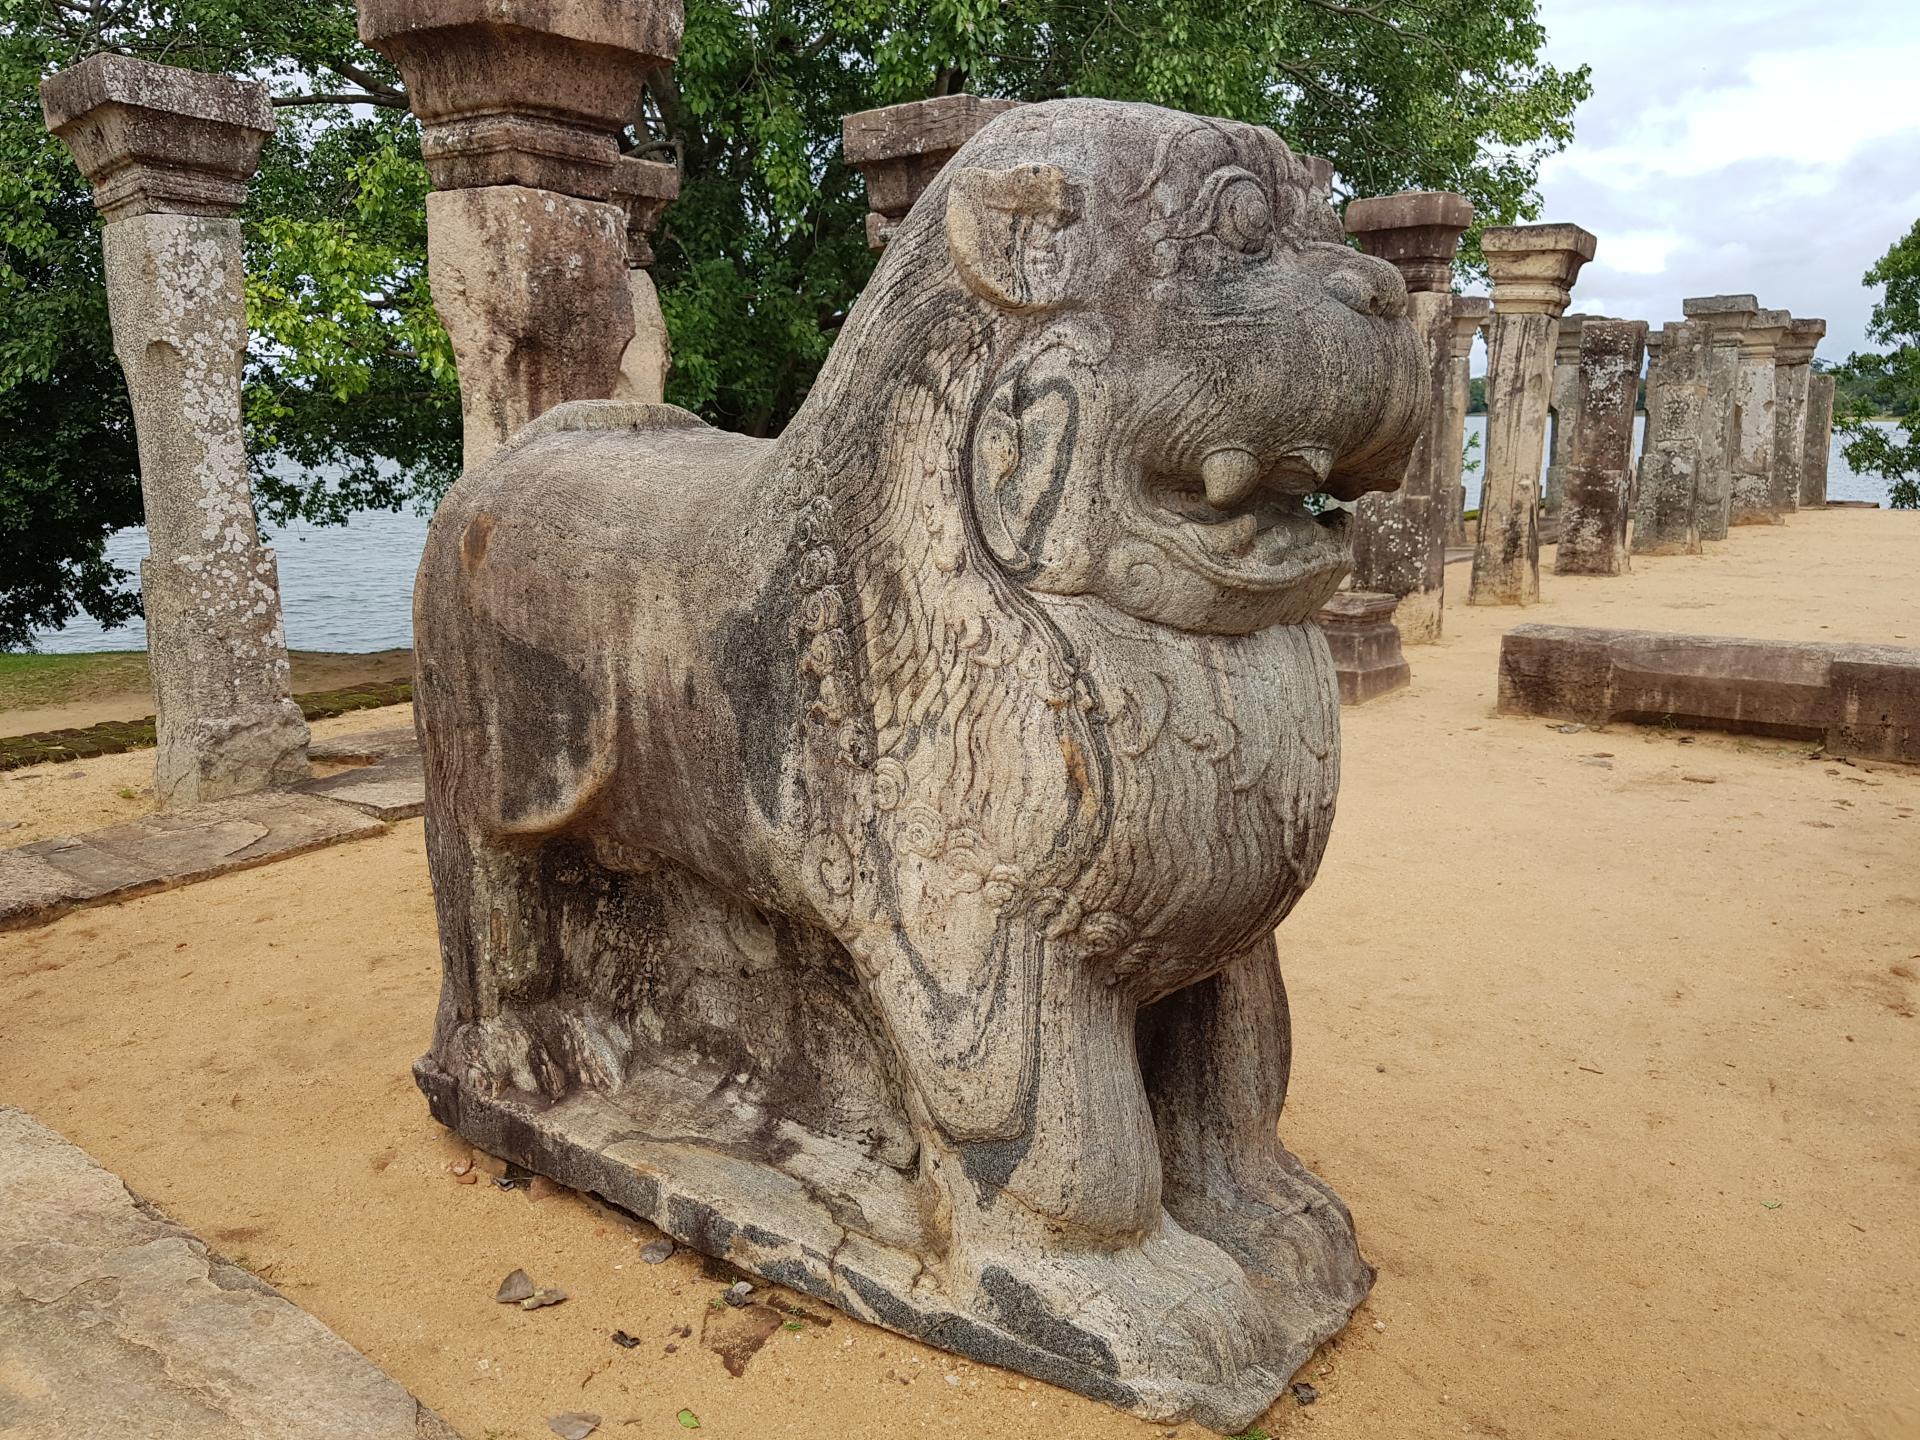 Каменный лев, Полоннарува, Шри-Ланка.